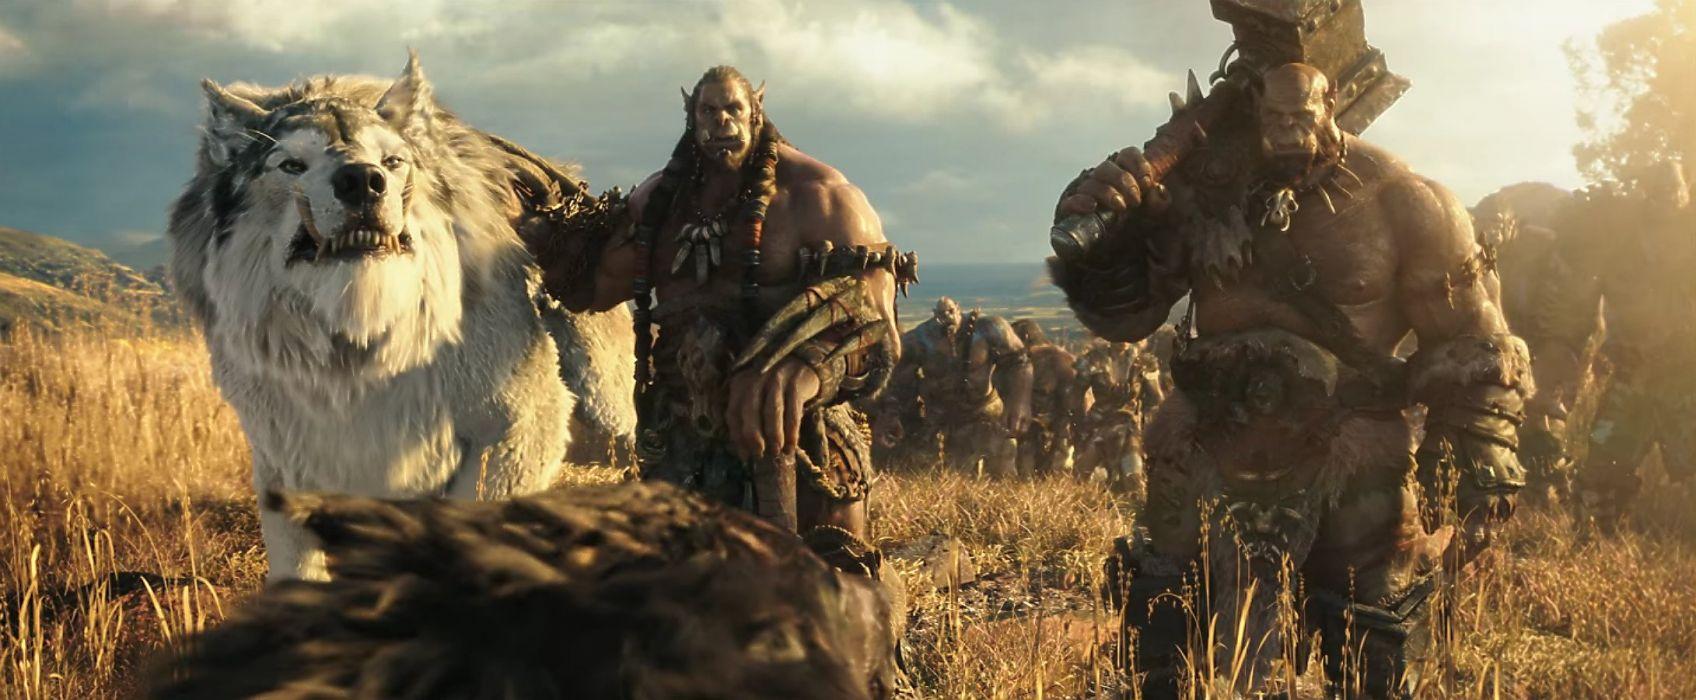 WARCRAFT Beginning fantasy action fighting warrior adventure world 1wcraft monster creature ogre wolf wolves wallpaper